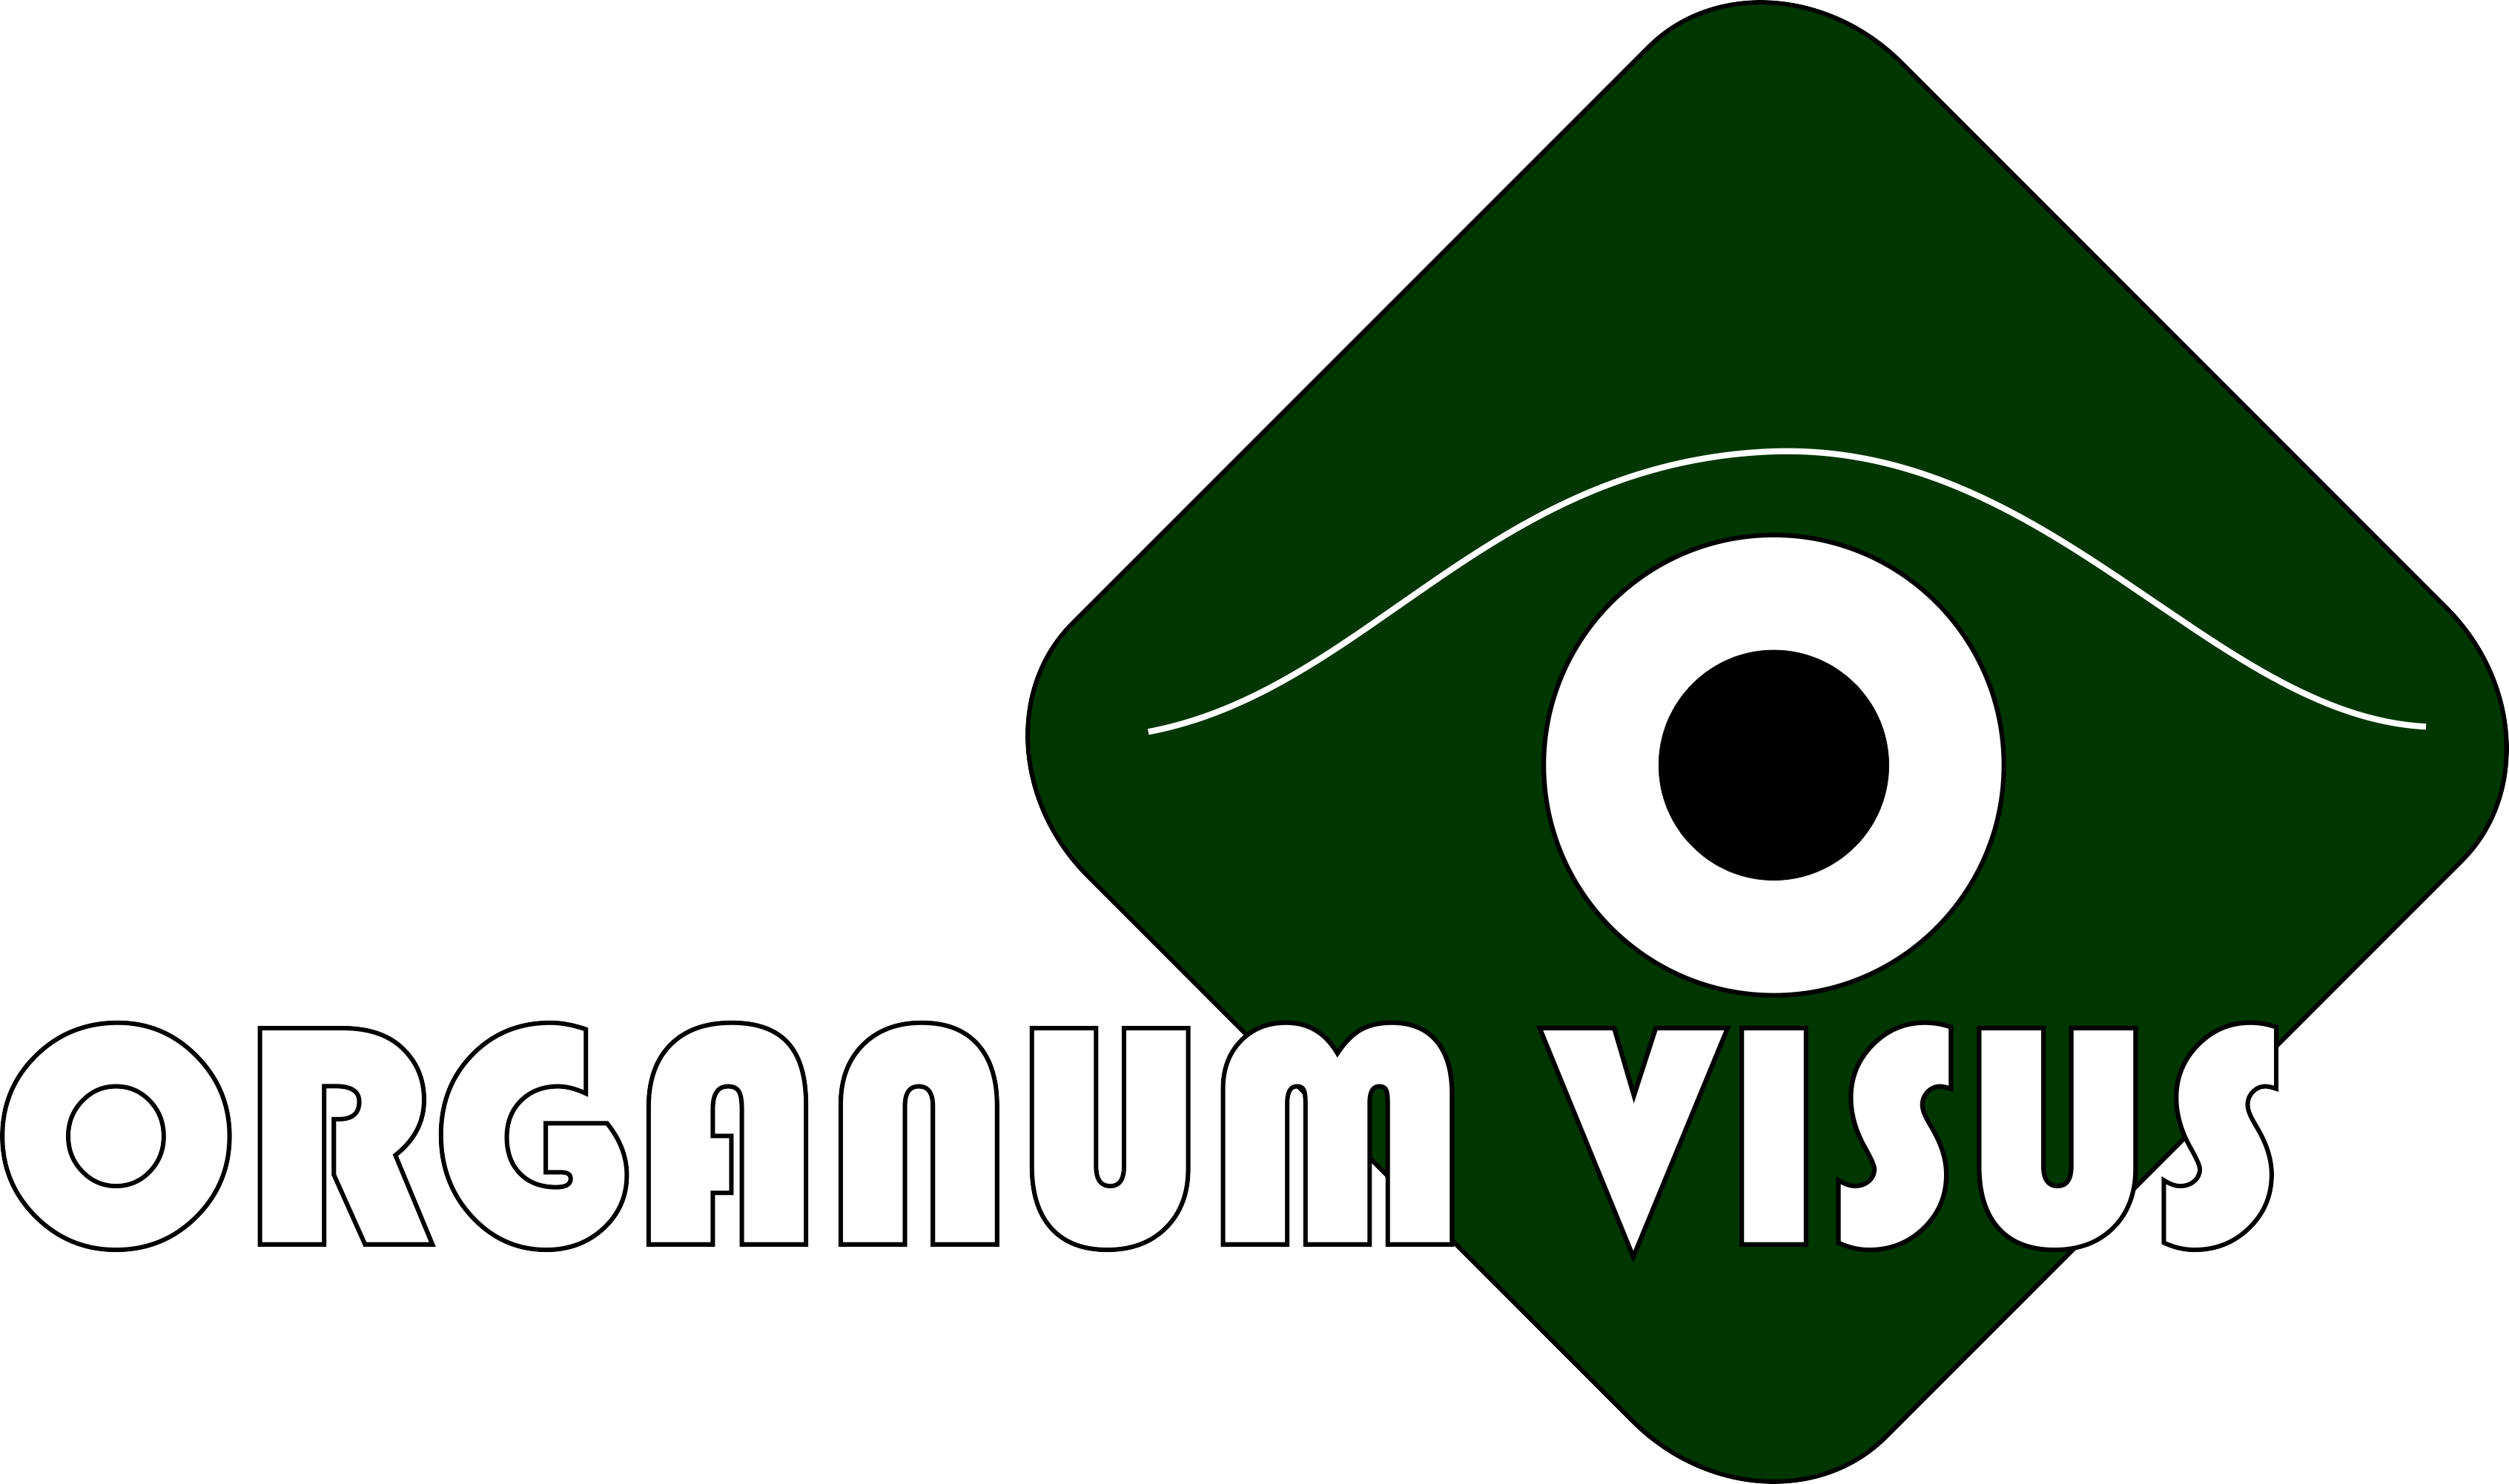 Organum Visus - Орган Зрения